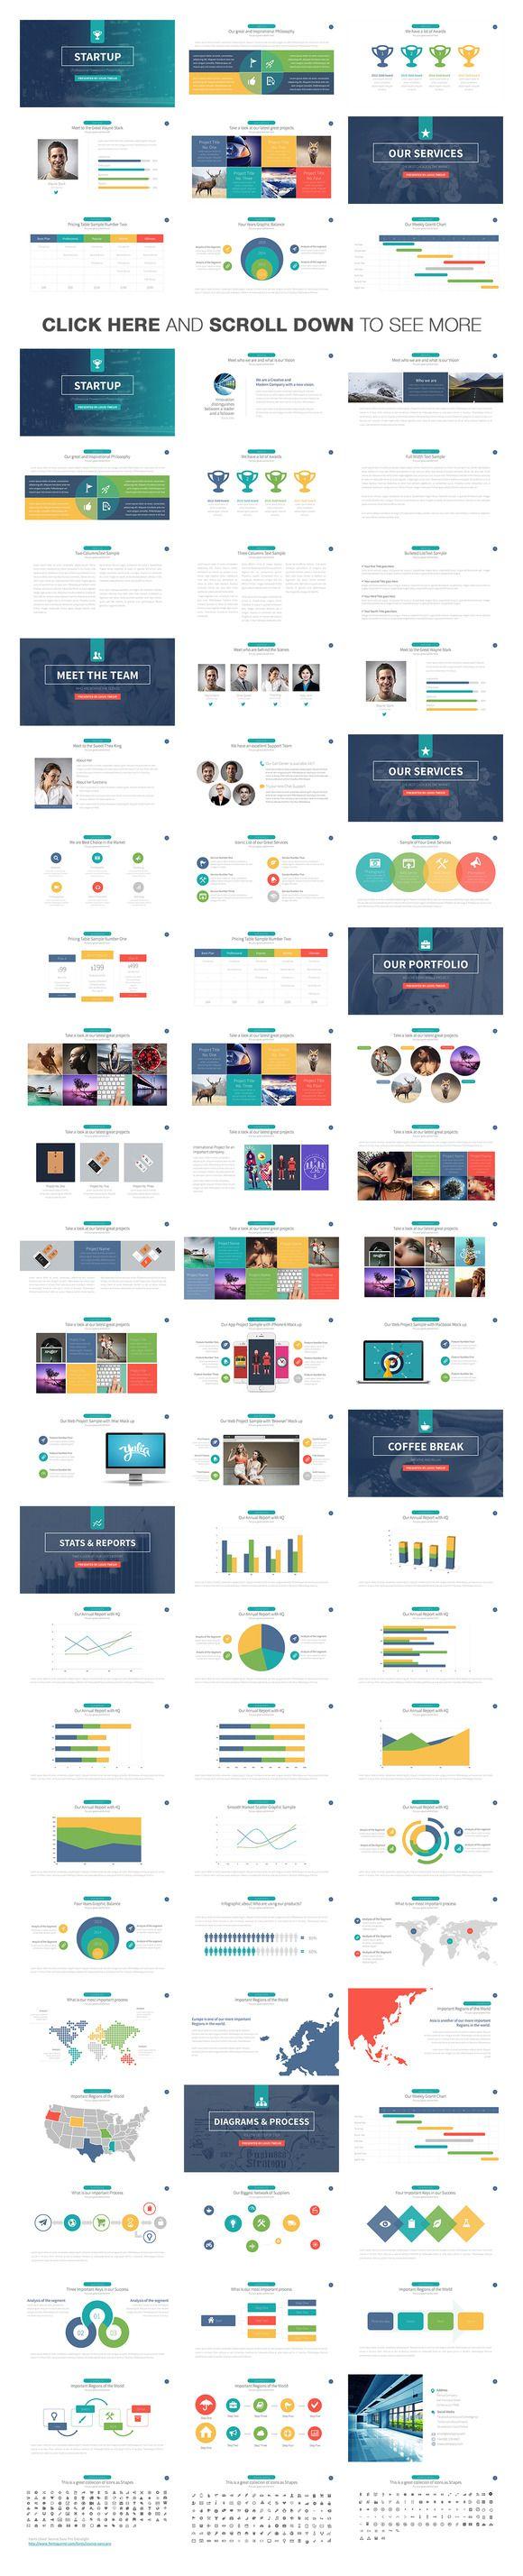 Best Marketing Mayhem Images On Pinterest Powerpoint - Sample marketing presentation ppt